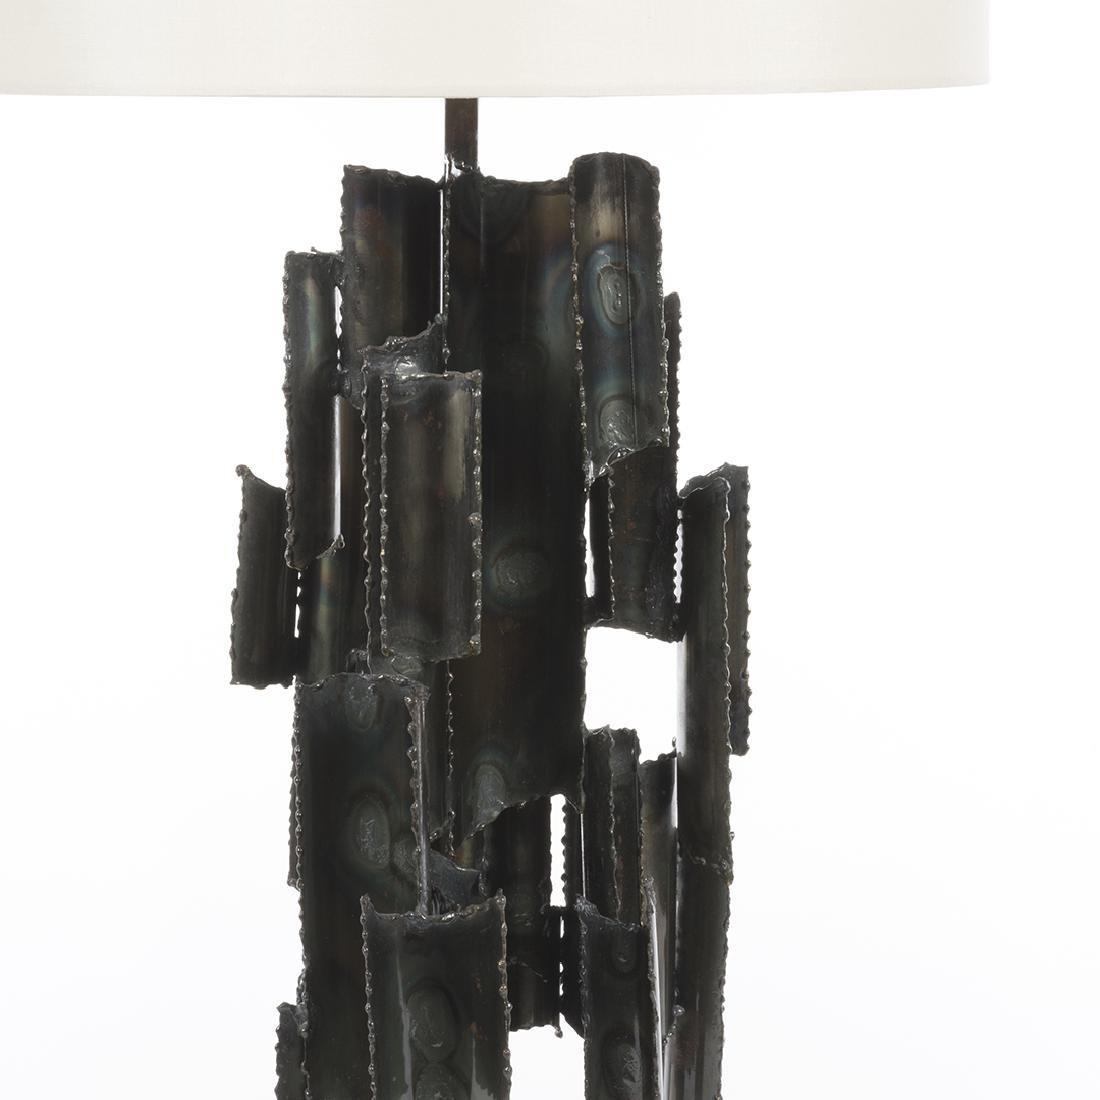 Marcello Fantoni Studio Burnished Metal Table Lamp - 4